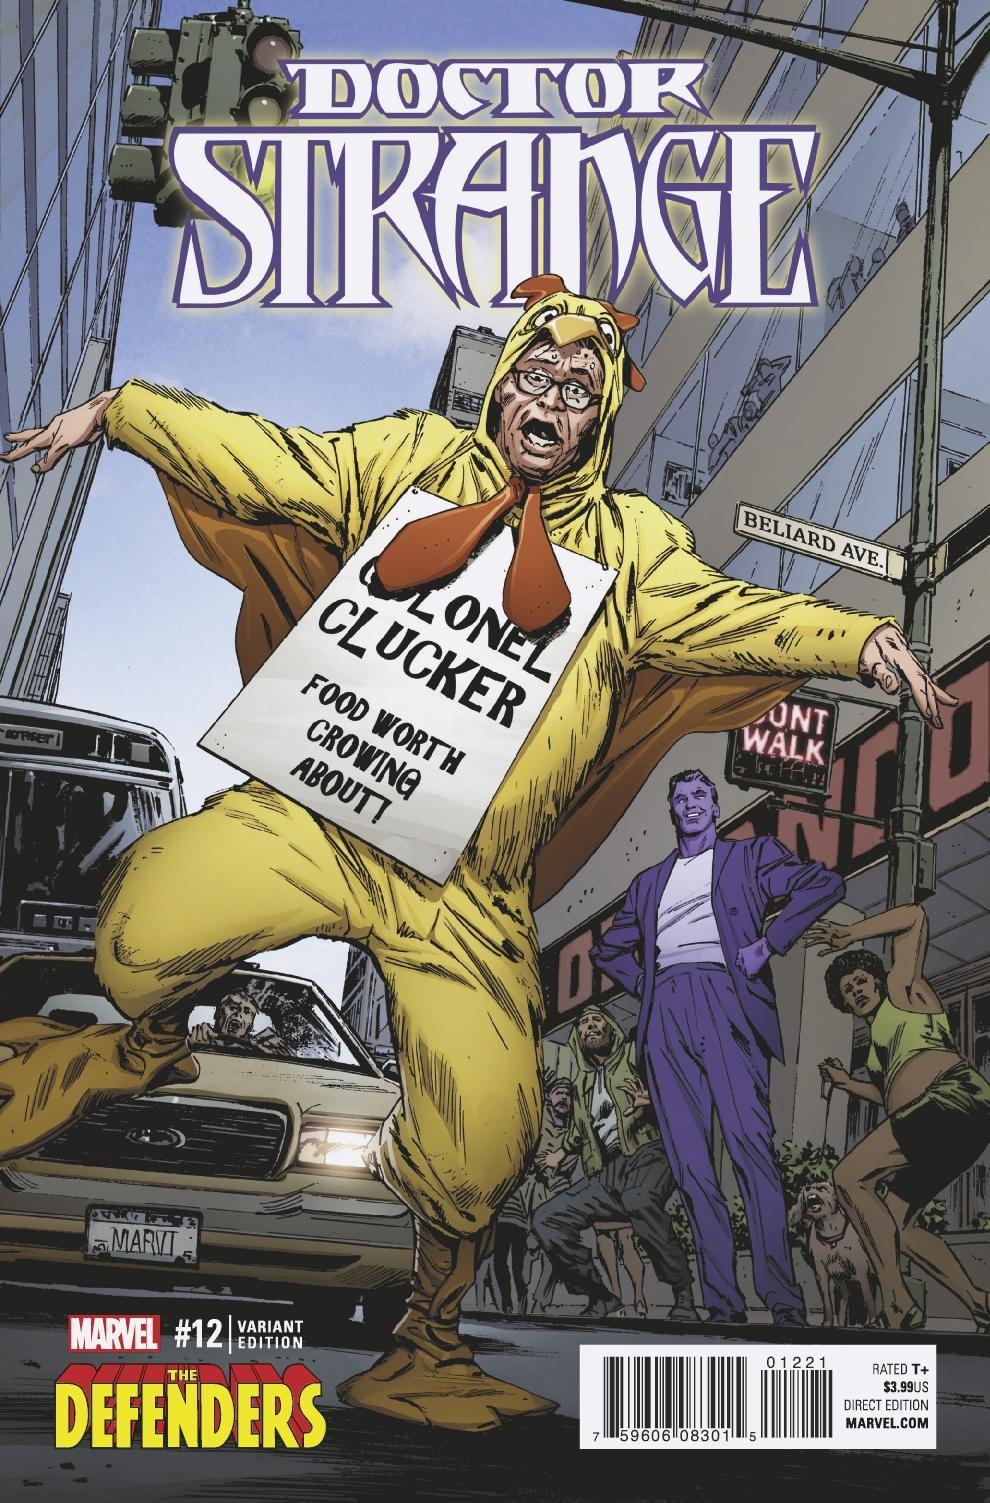 DOCTOR STRANGE #12 DEFENDERS variant cover